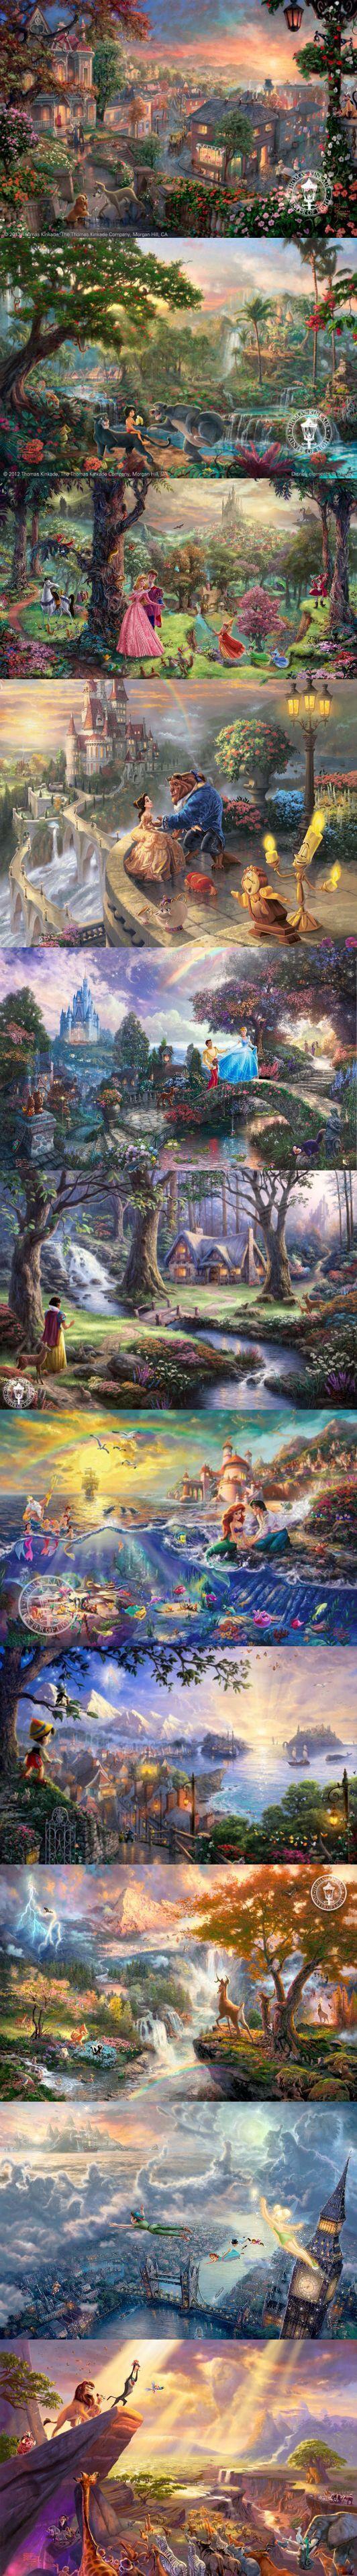 Thomas Kinkade Disney...love all these! So beautiful!